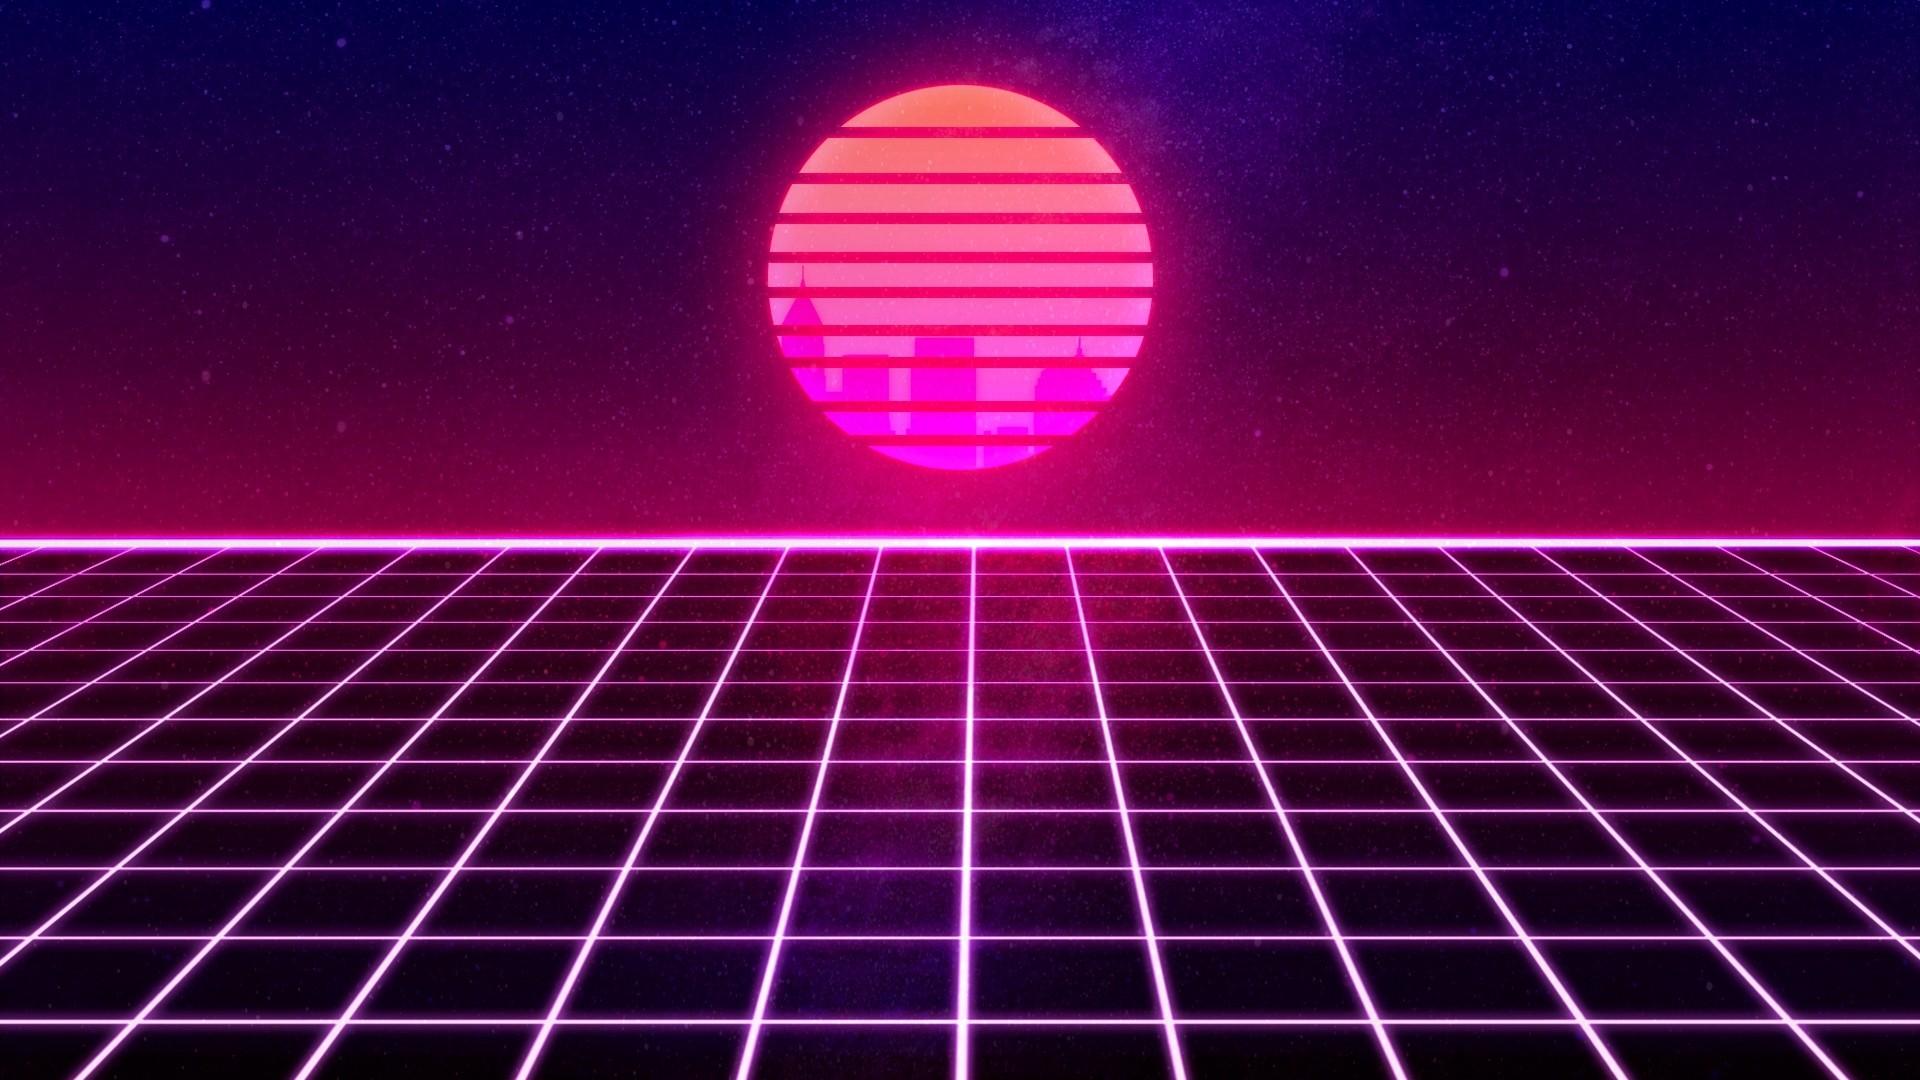 Aesthetic Retro computer wallpaper